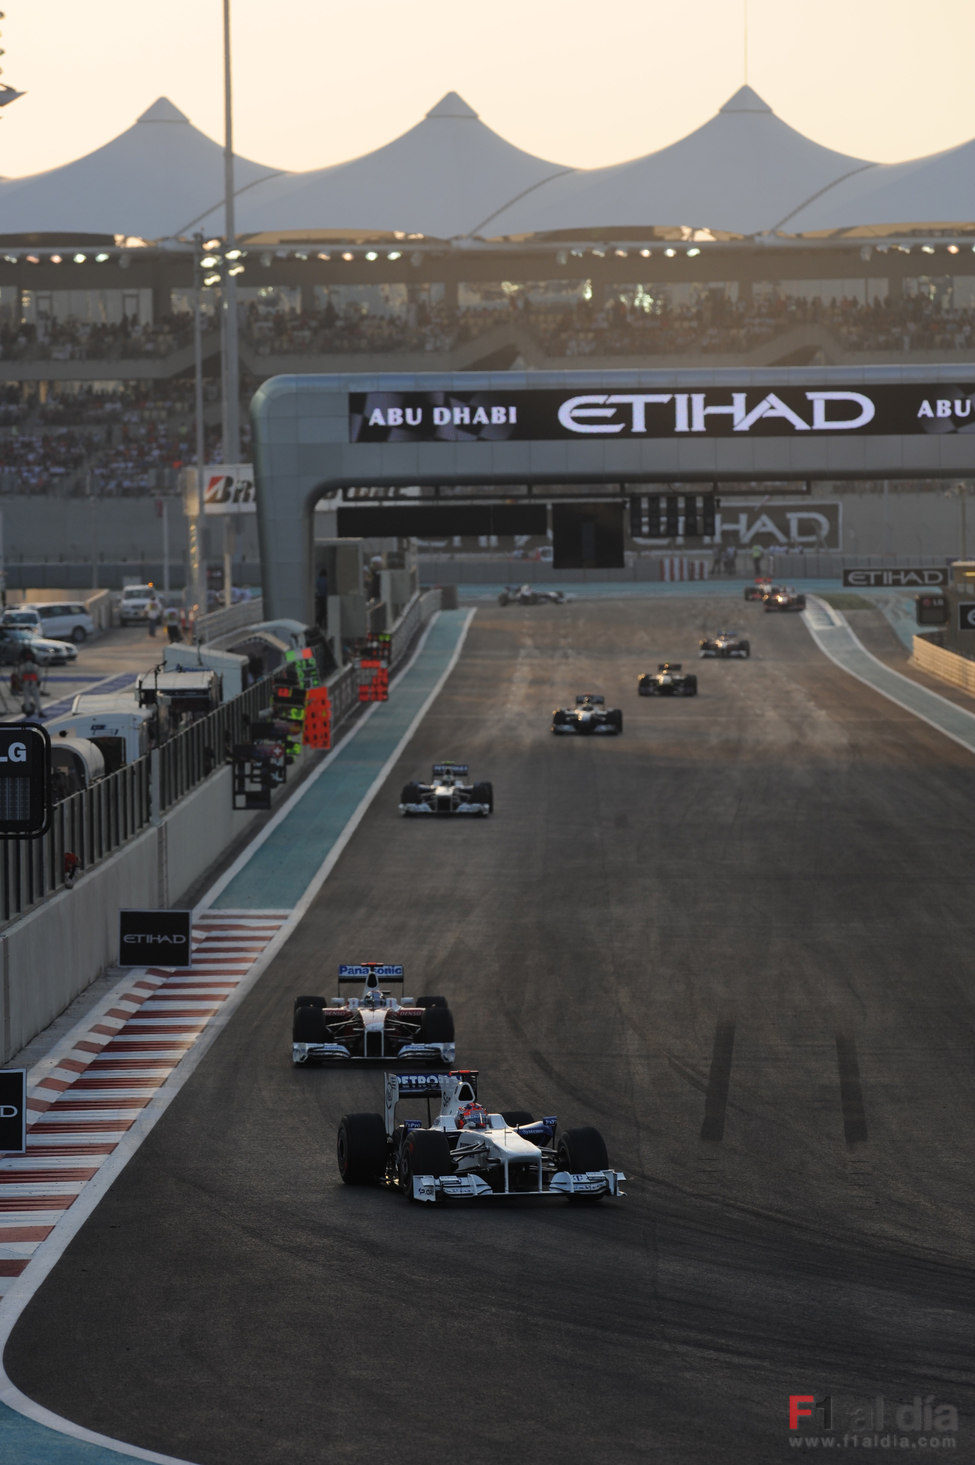 Kubica en Abu Dhabi